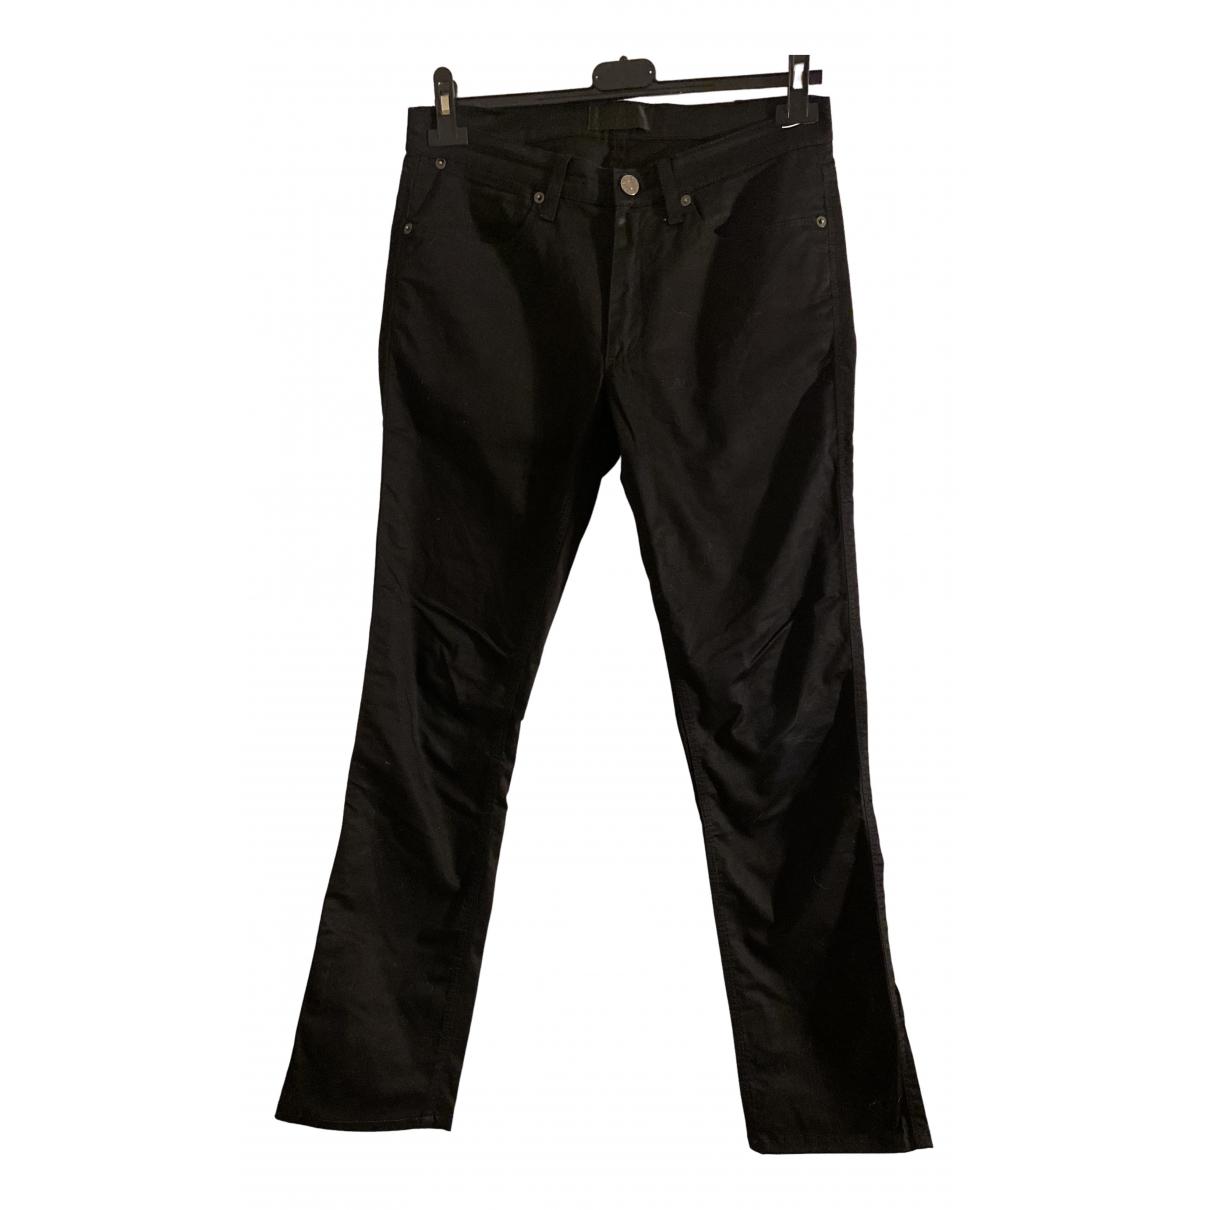 Acne Studios N Black Cotton - elasthane Jeans for Women 29 US